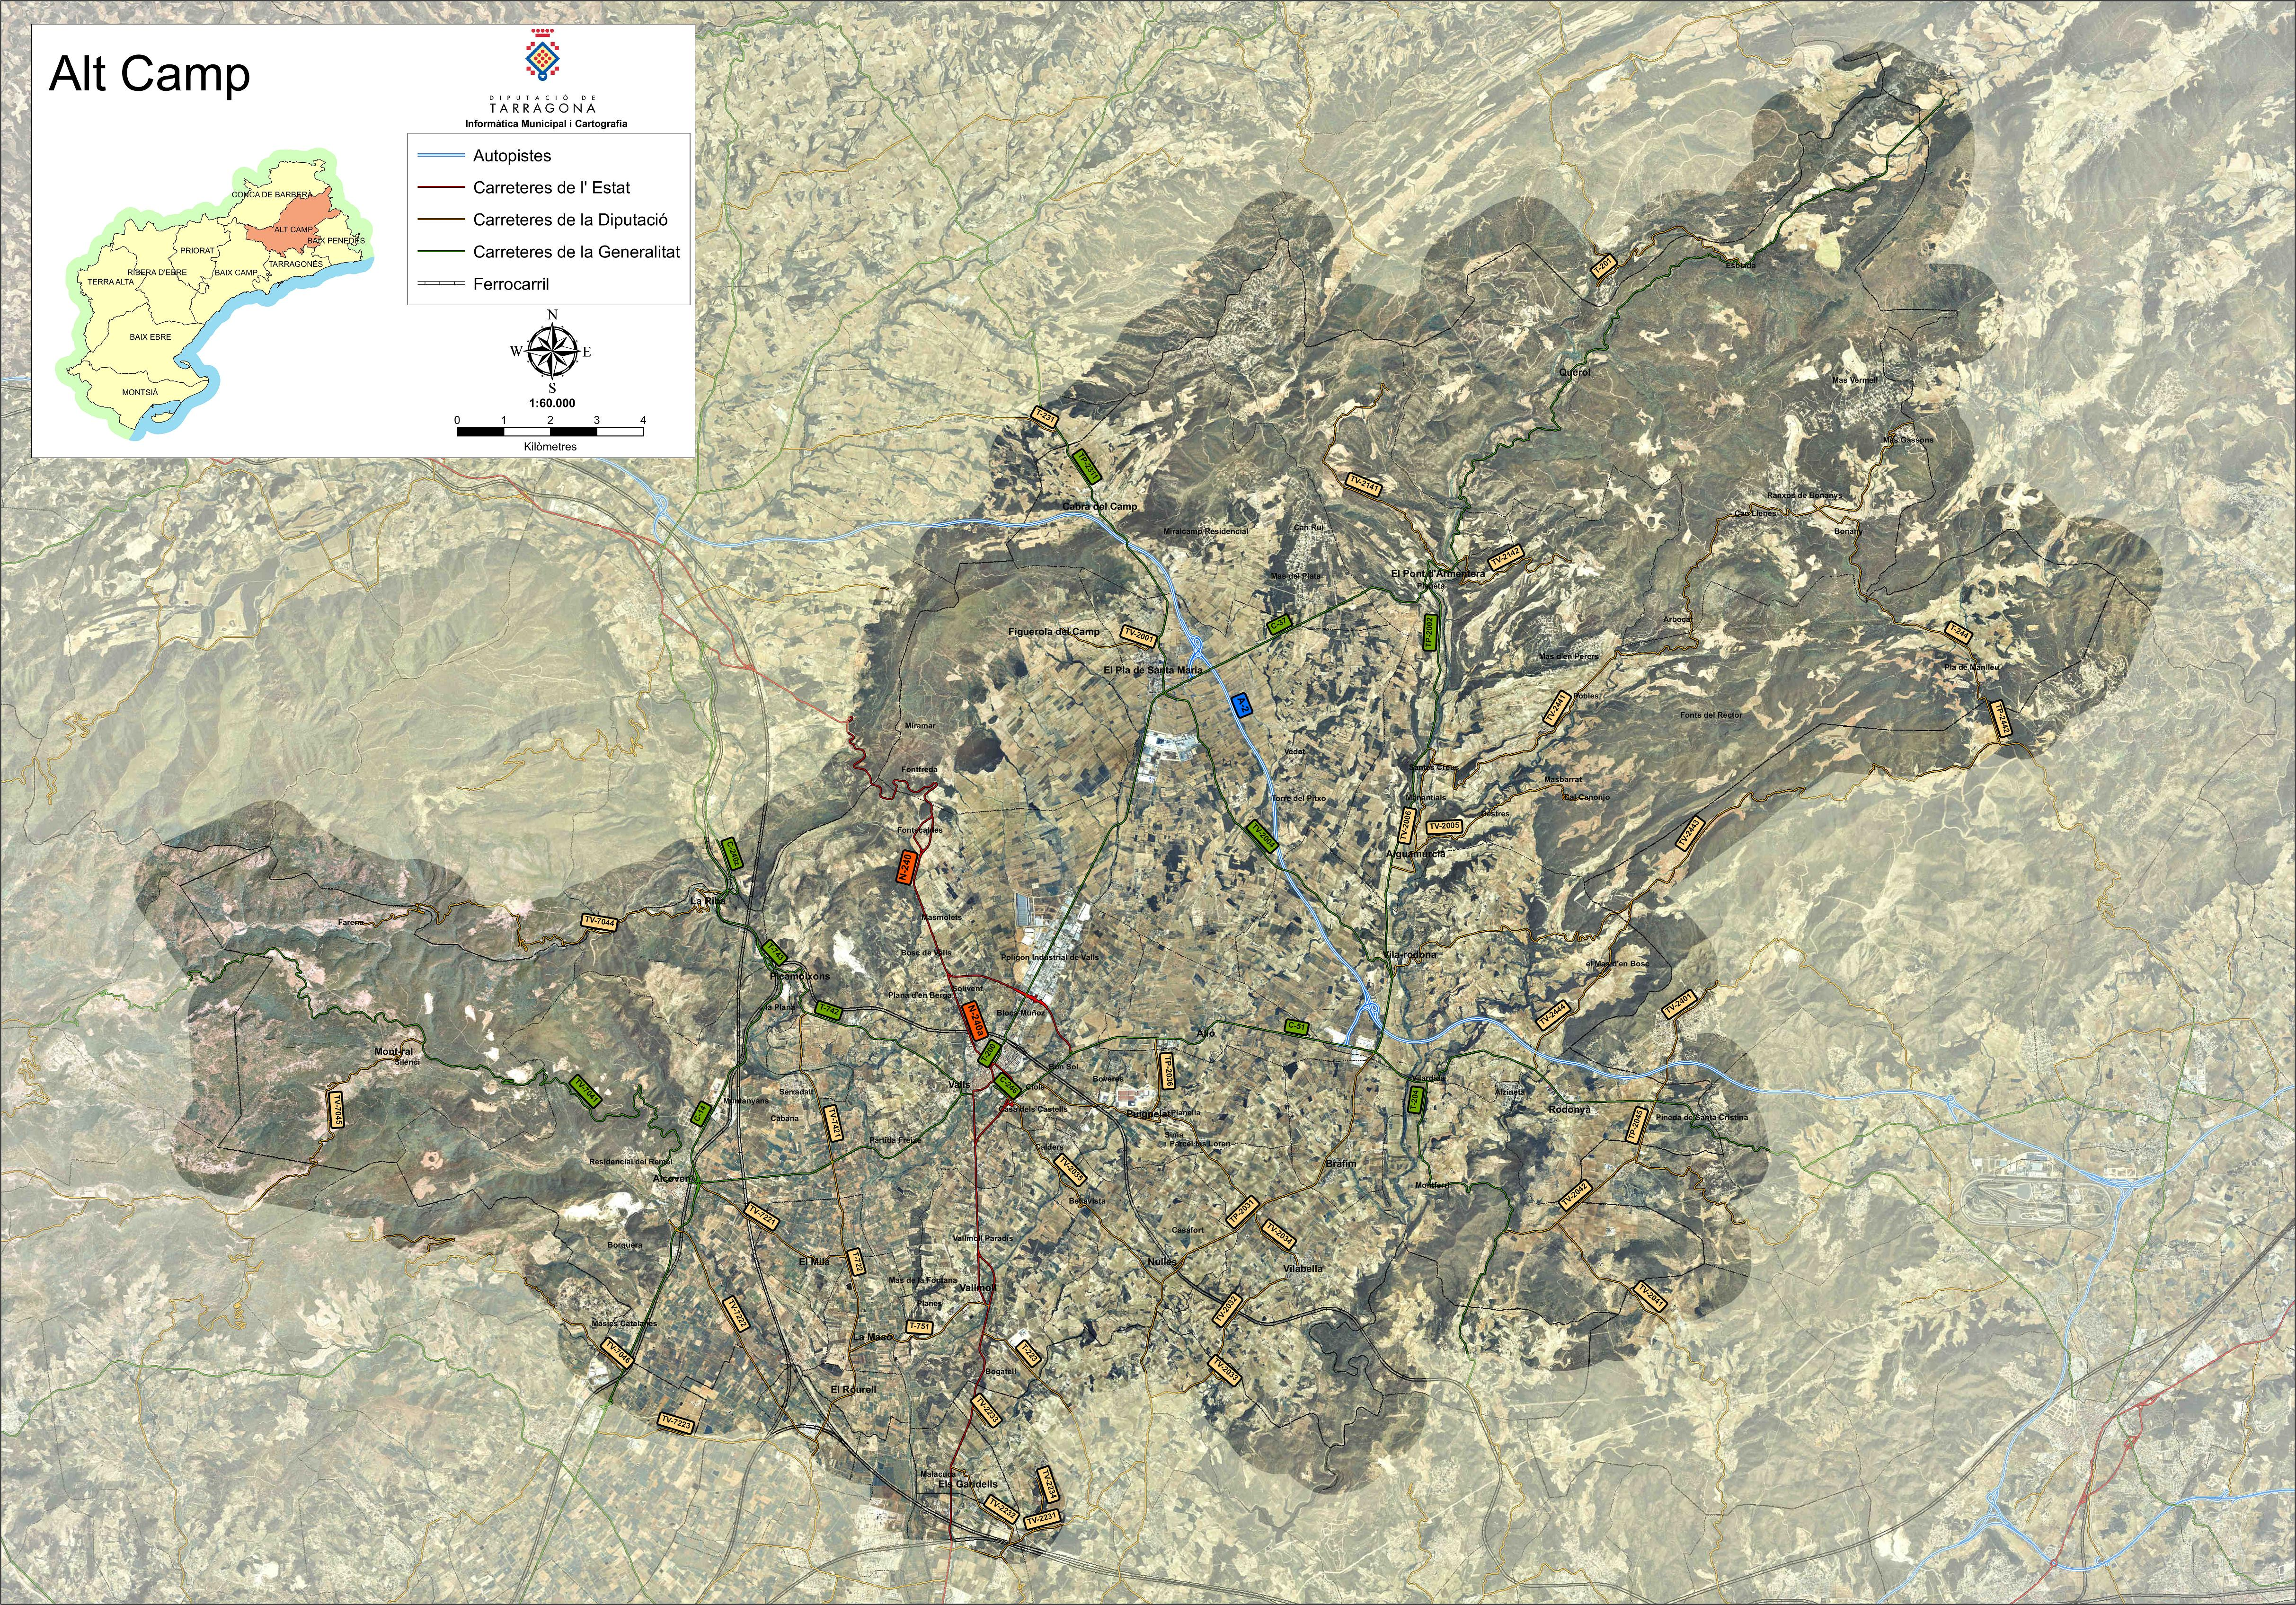 Mapa satelital con carreteras de la comarca de Alt Camp